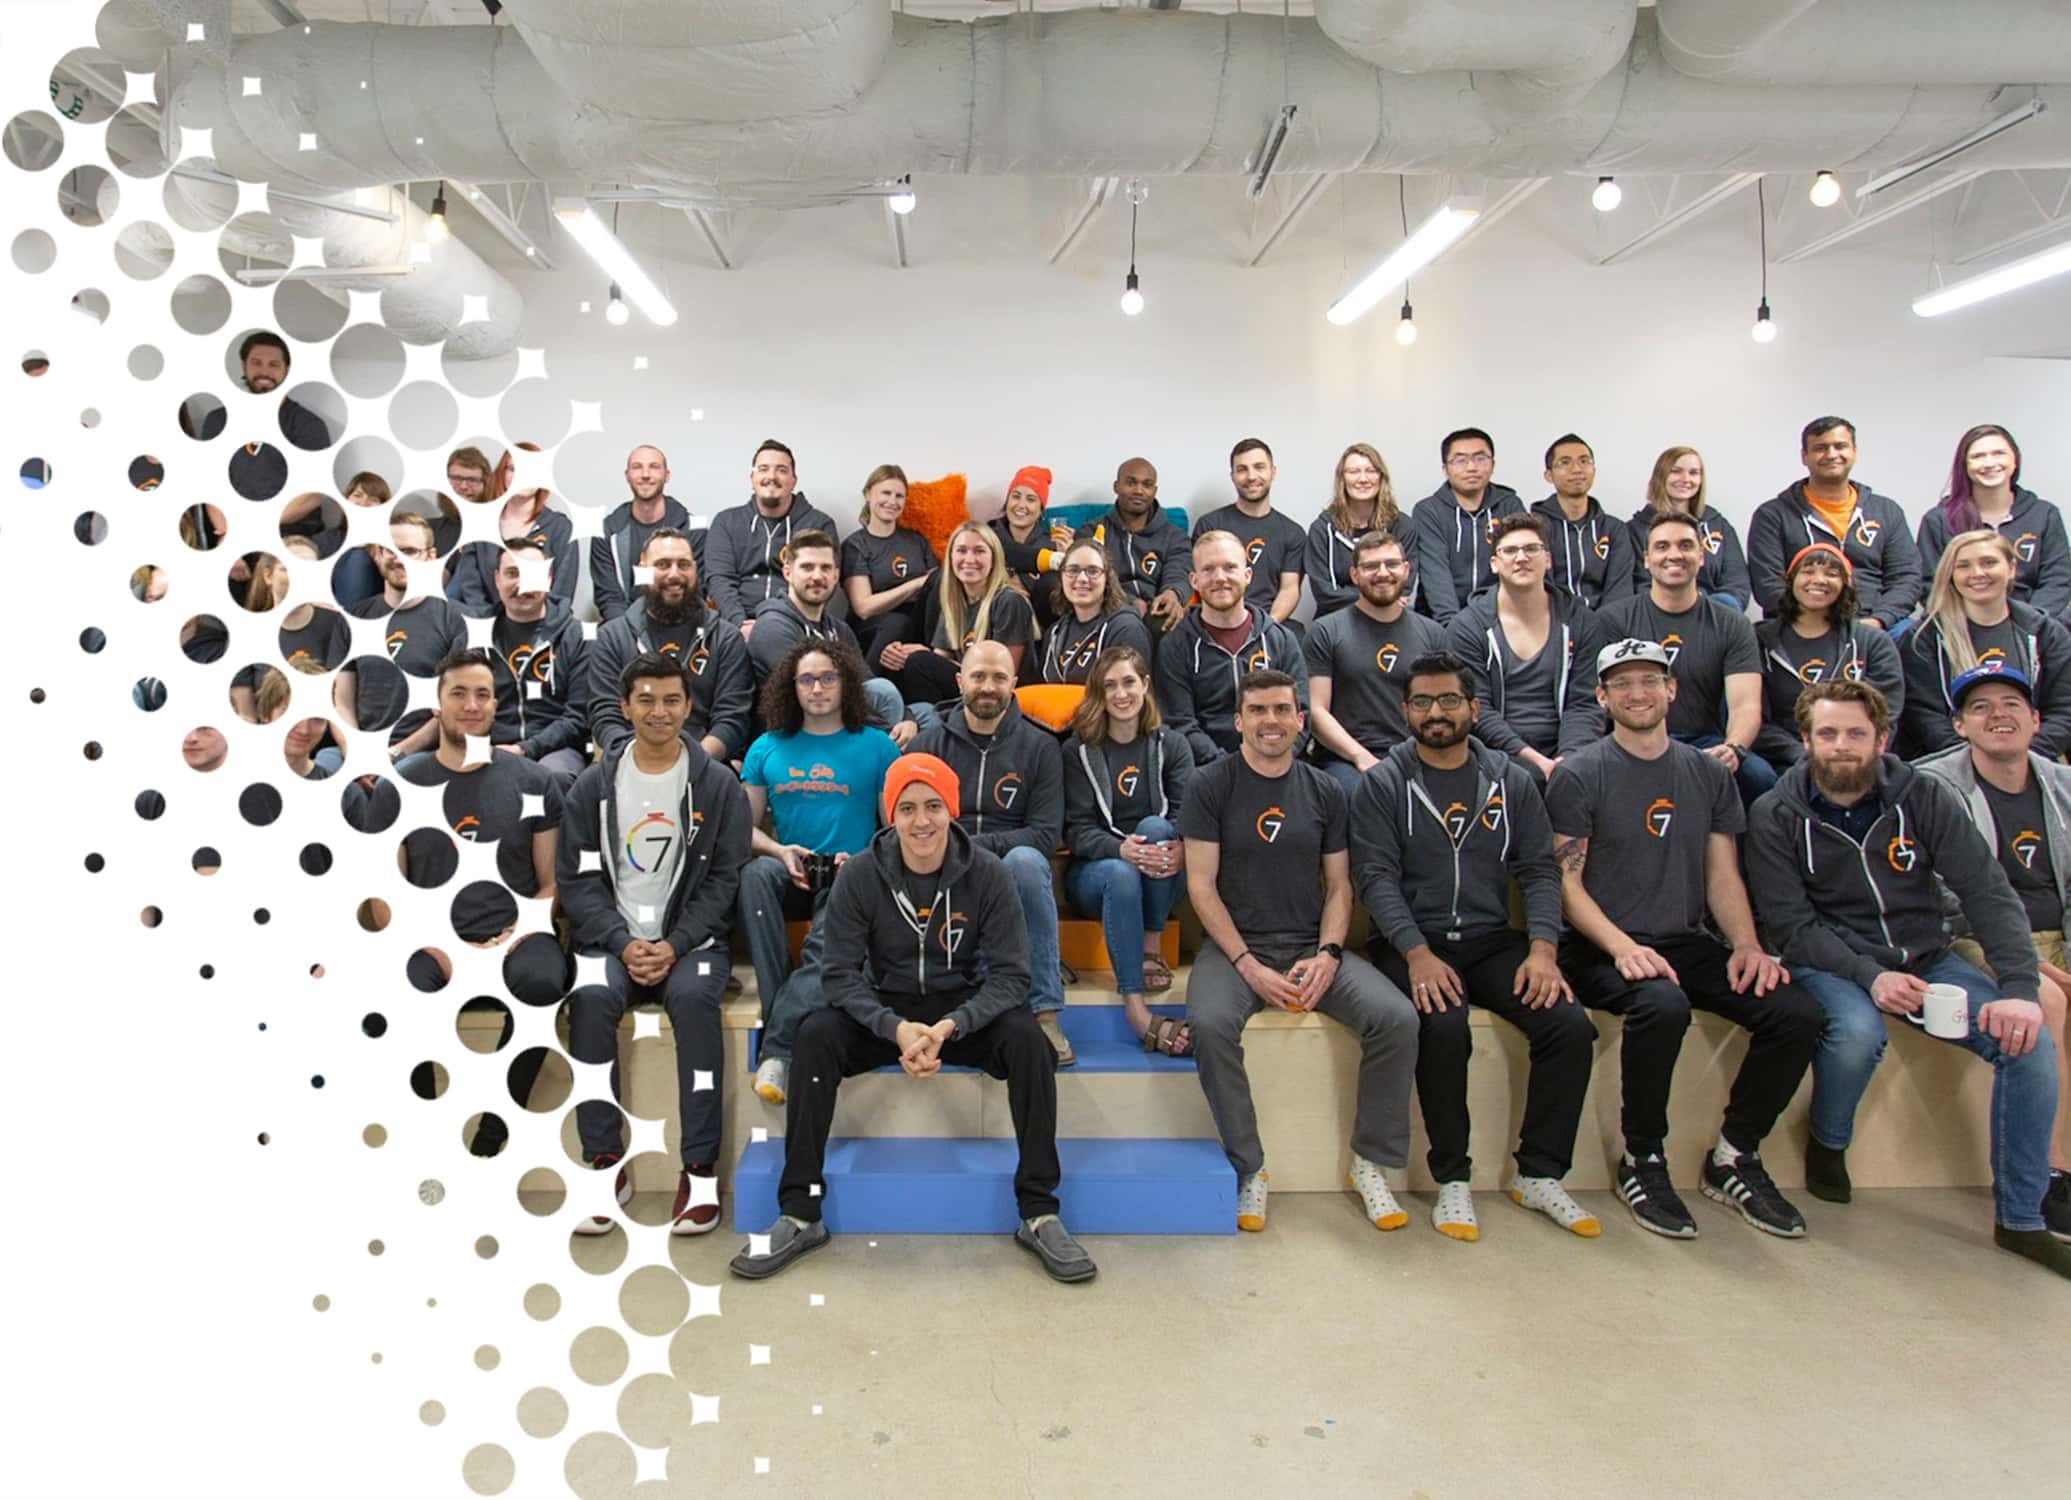 7shifts team photo 2019